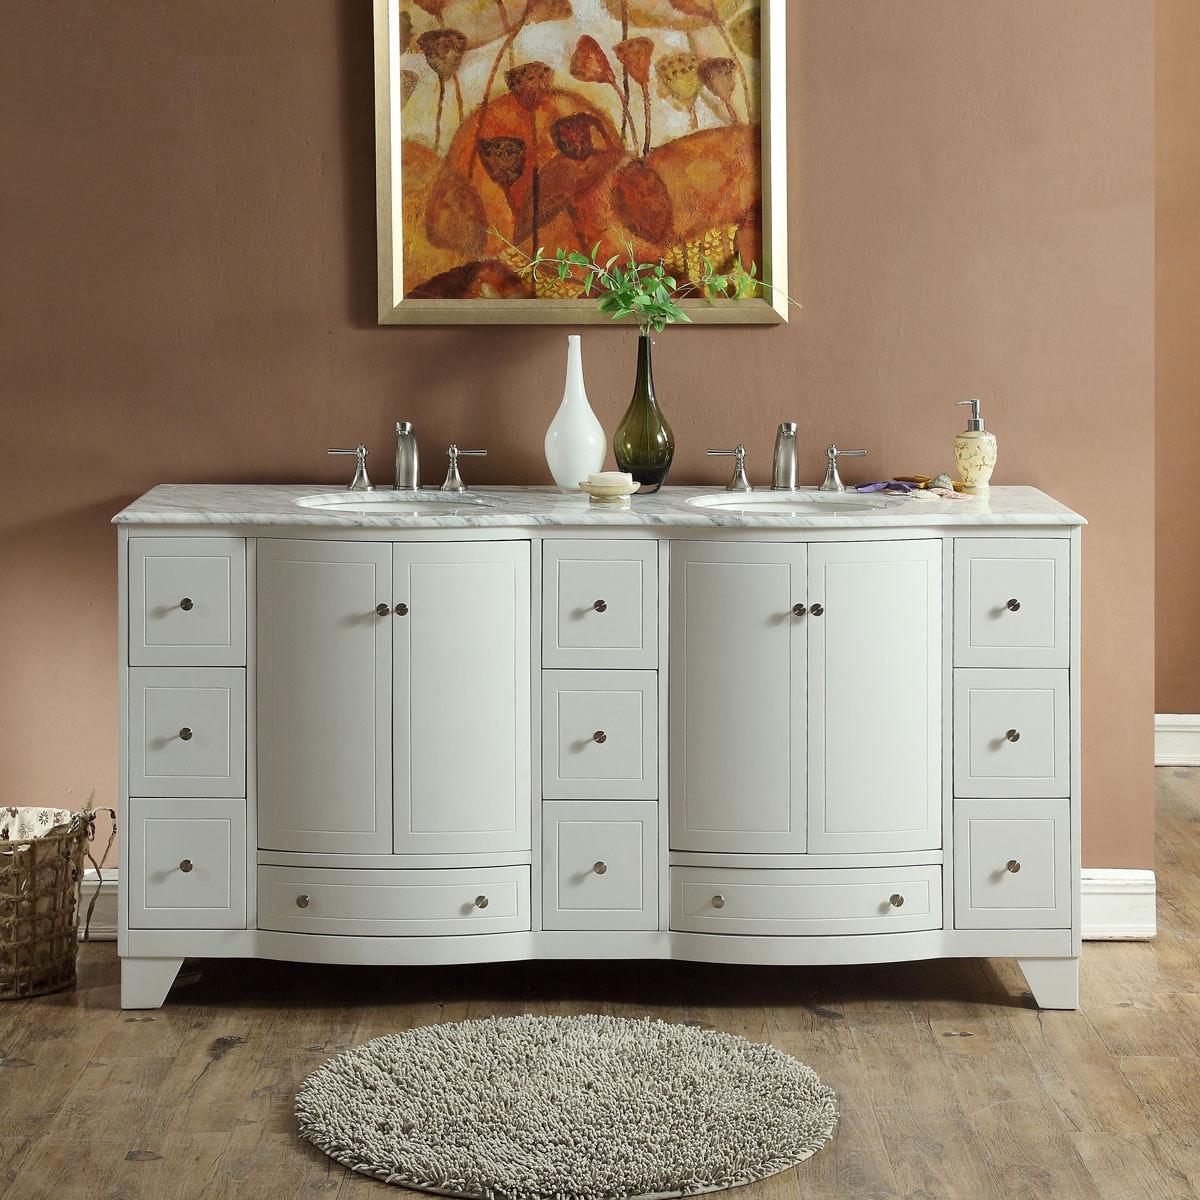 Silkroad Exclusive 72 Inch Transitional Bathroom Vanity Double Sink Cabinet